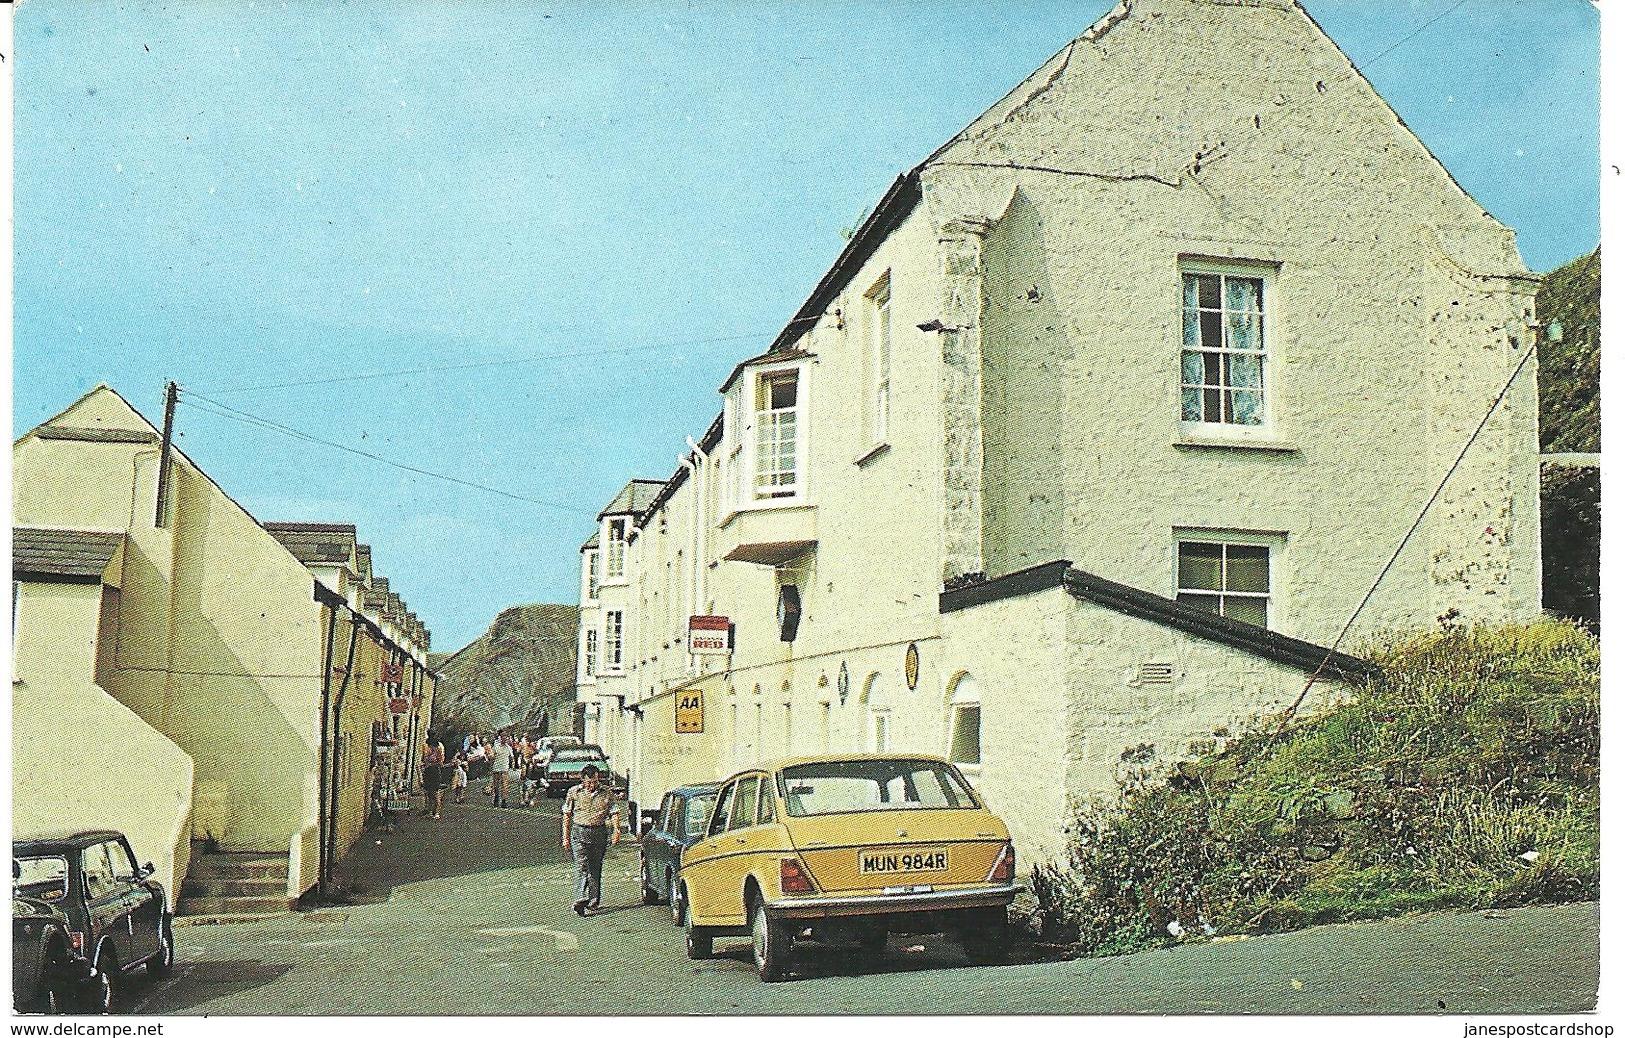 1980's Postcard HARTLAND QUAY HOTEL - HARTLAND - DEVON WITH MINI, CAPRI, AUSTIN - England